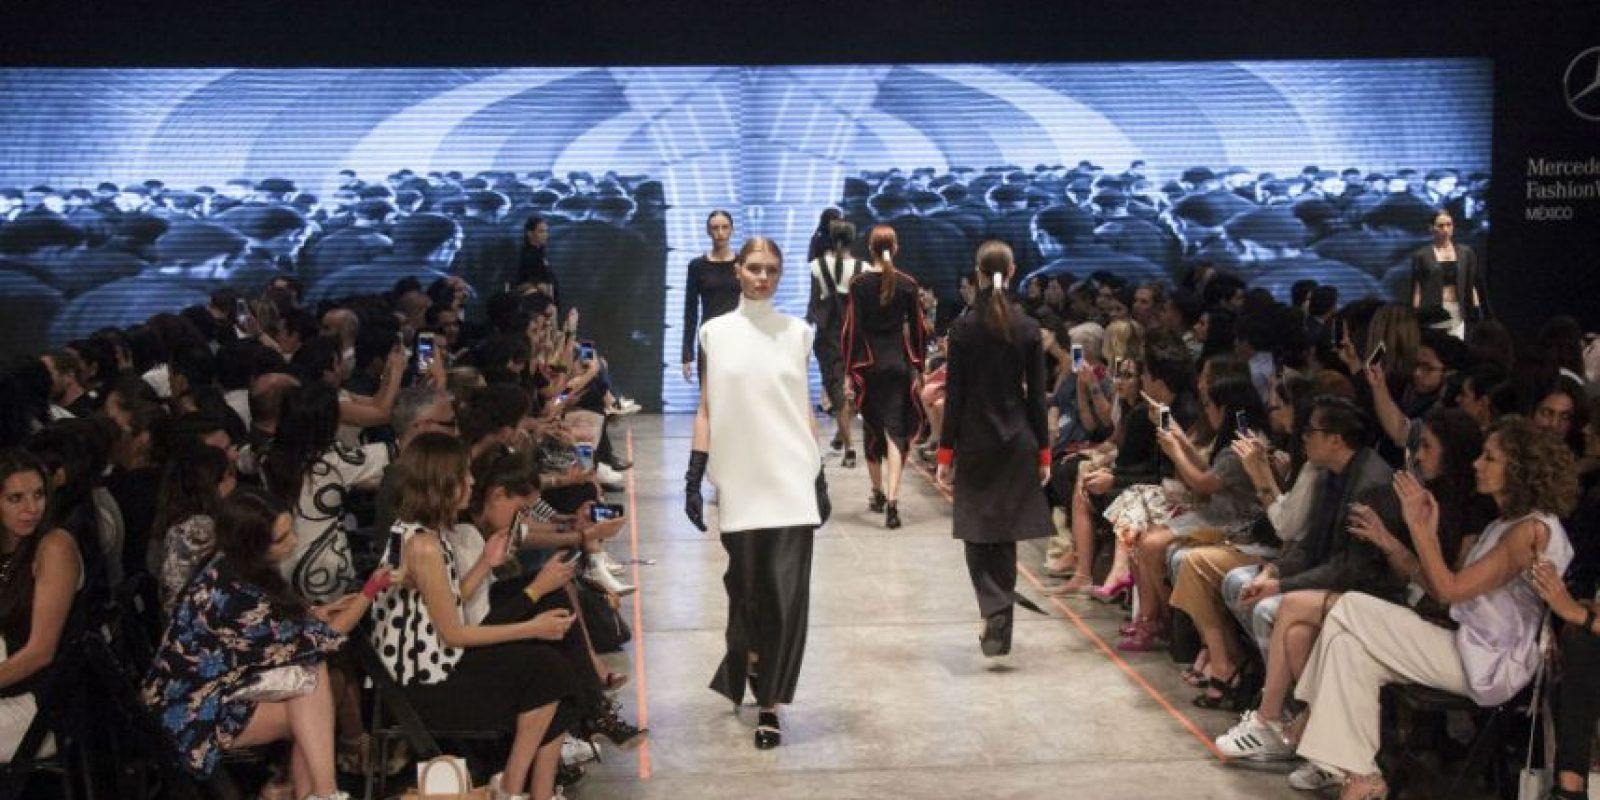 Así se vivió el segundo día del Mercedes Benz Fashion Week Foto:JDS